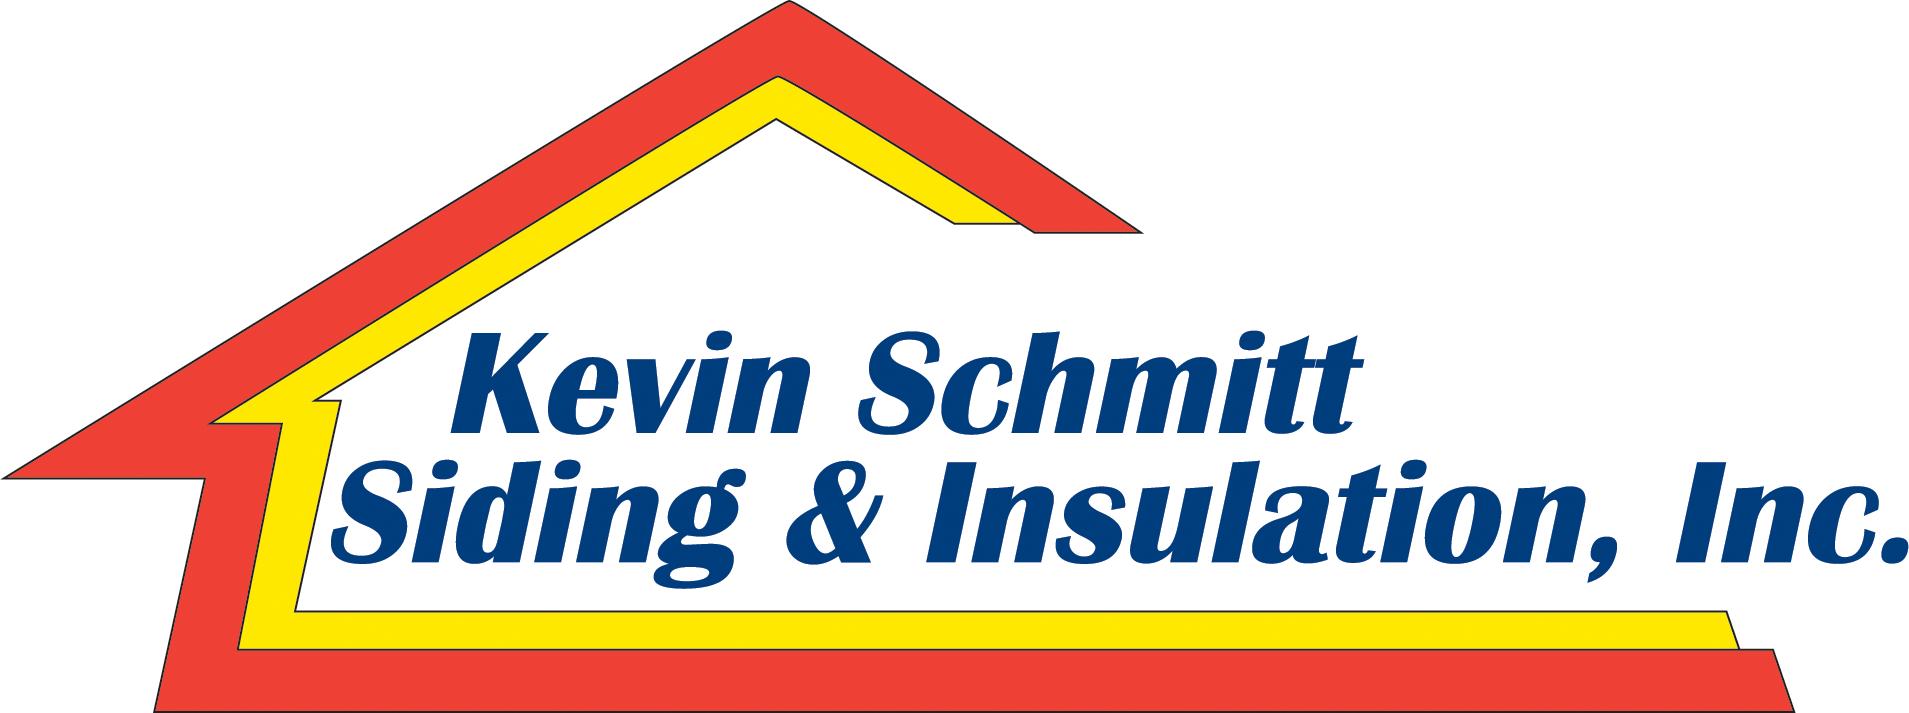 Kevin Schmitt Siding & Insulation, Inc.